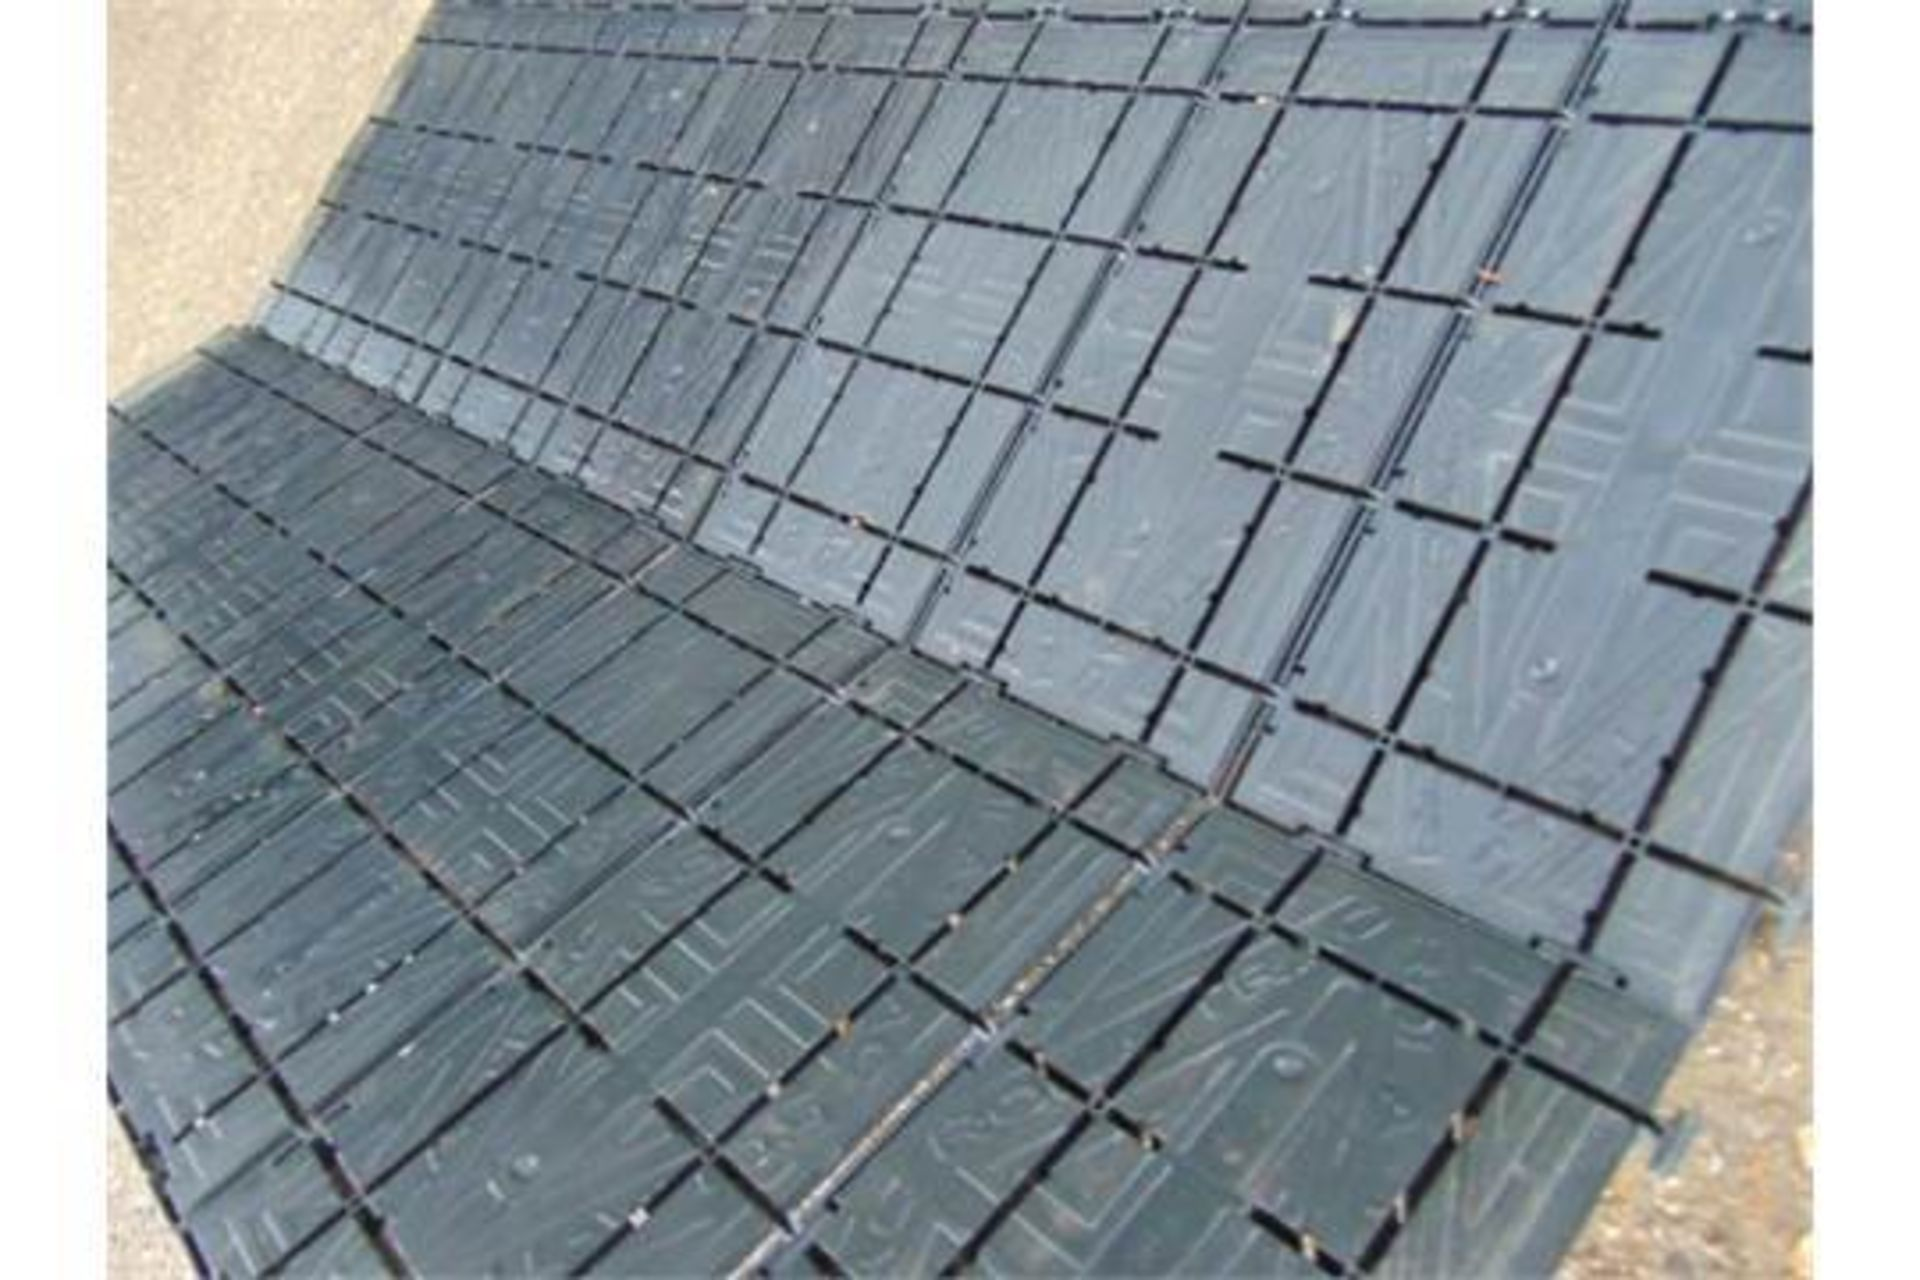 Lot 3 - Rola Trac Interlocking Flooring - Approx 49 Square Metres